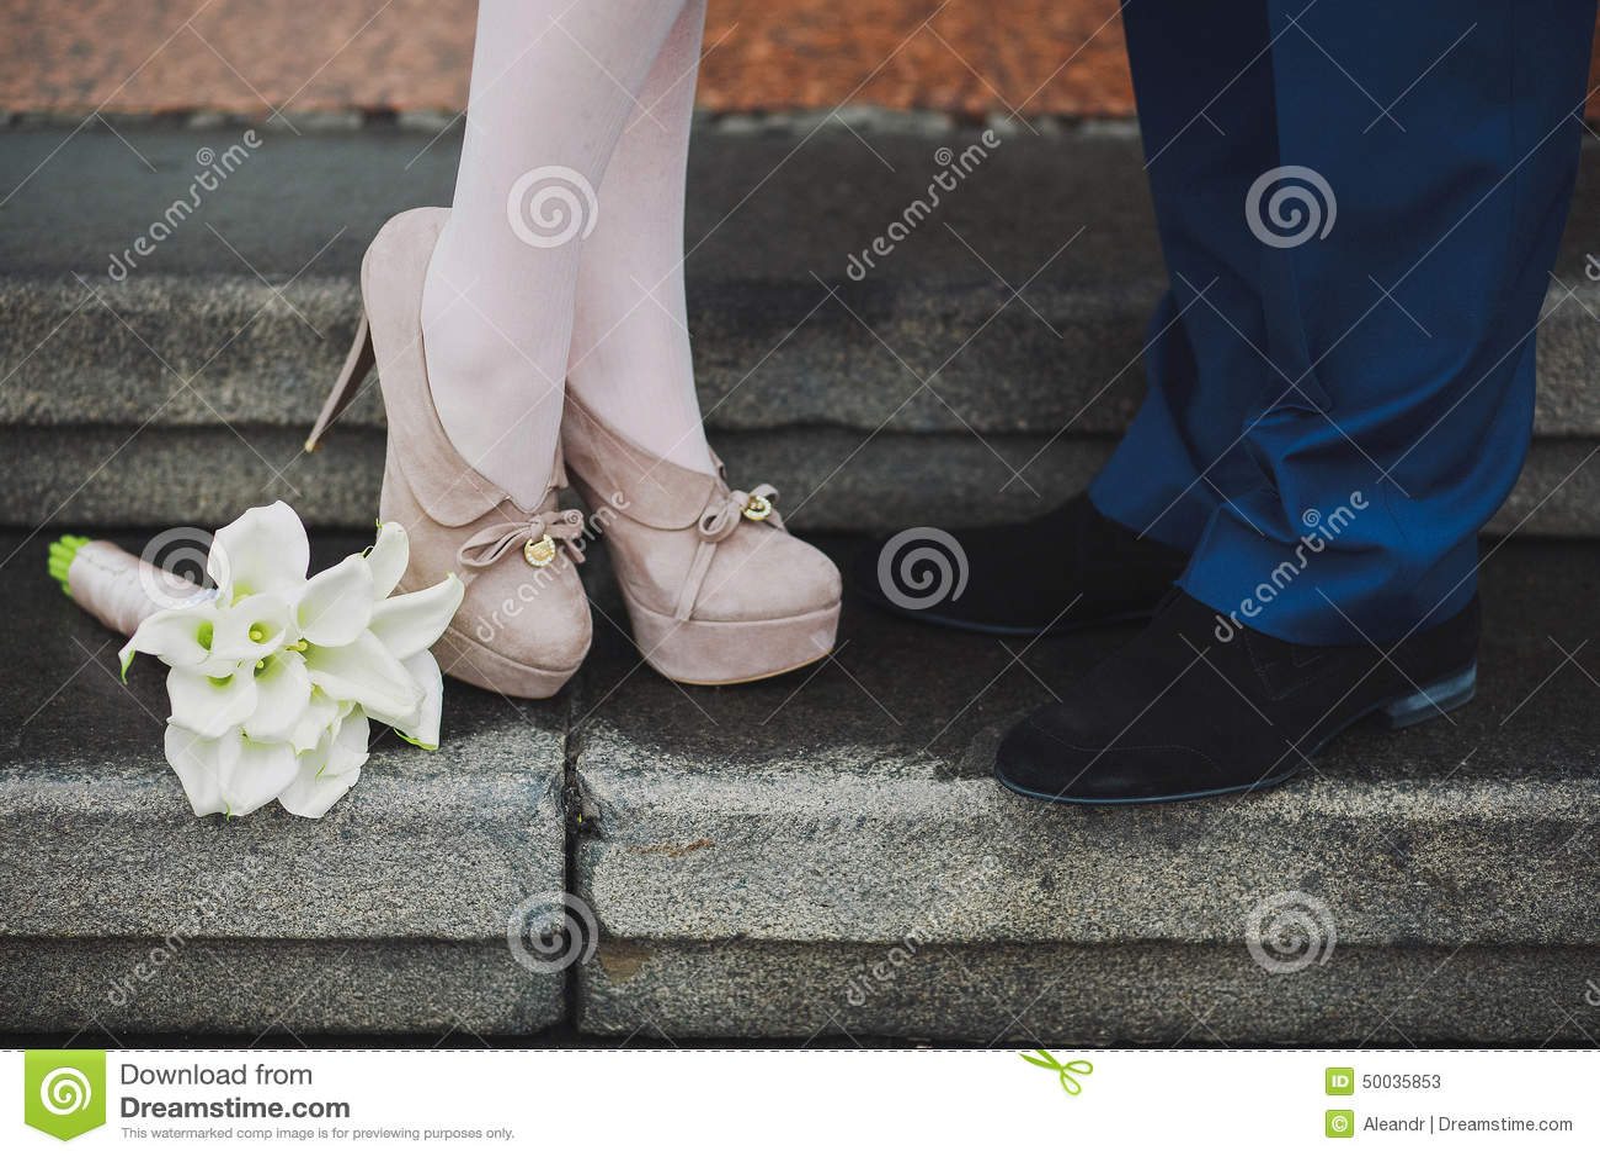 Фото подруга целует ноги подруге 19 фотография